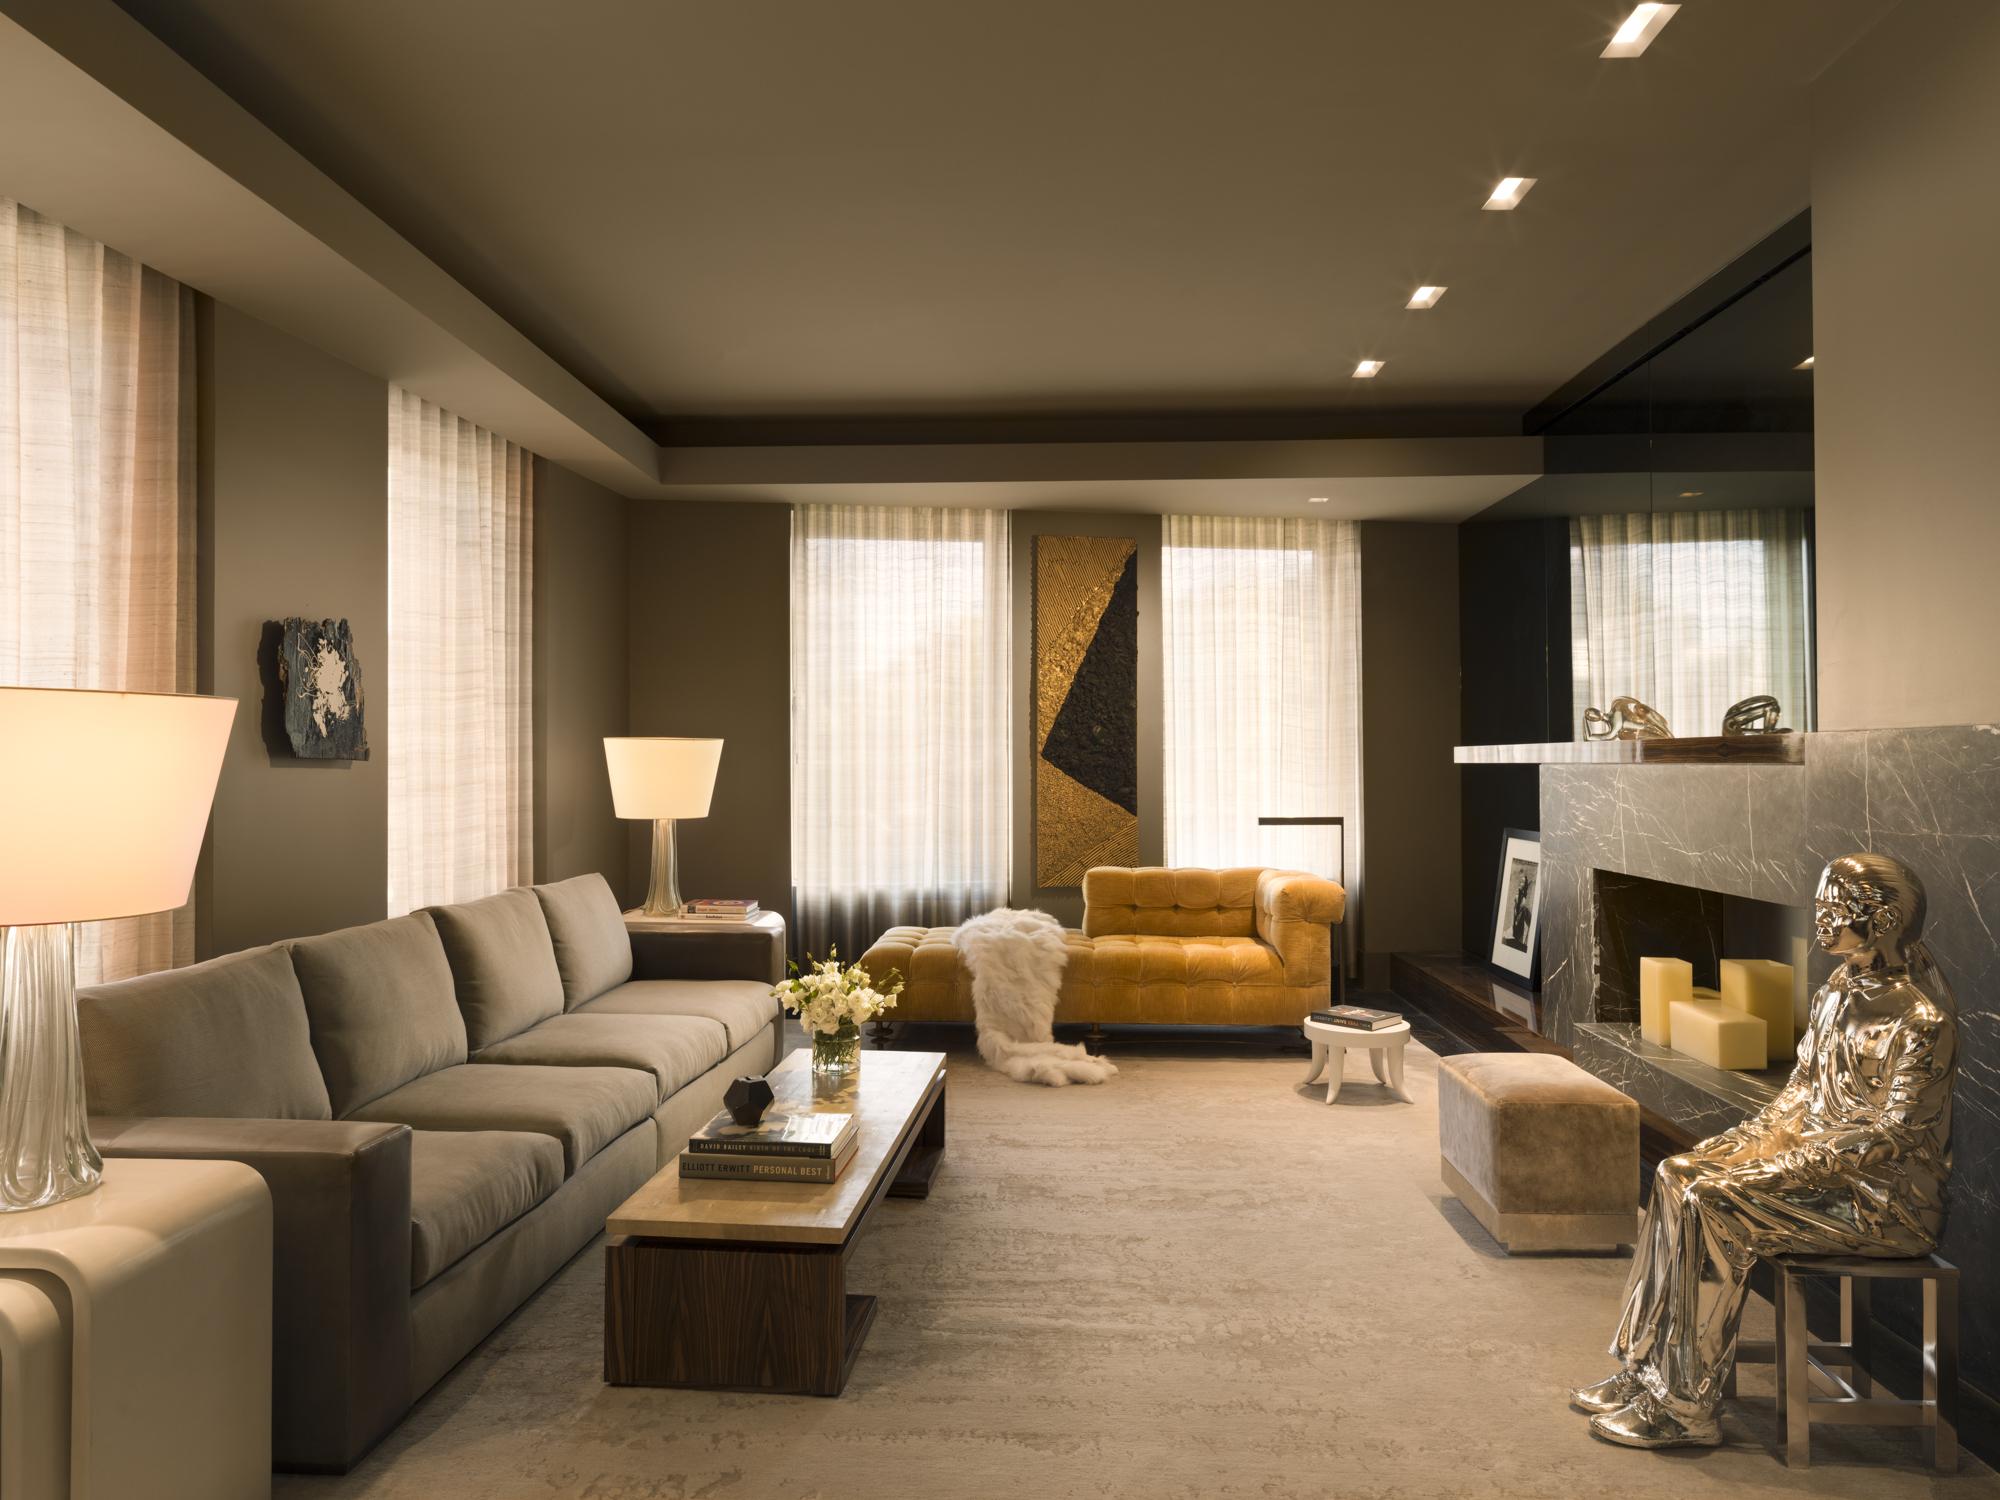 R Douglas Gellenbeck_Lafayette_living room.jpg